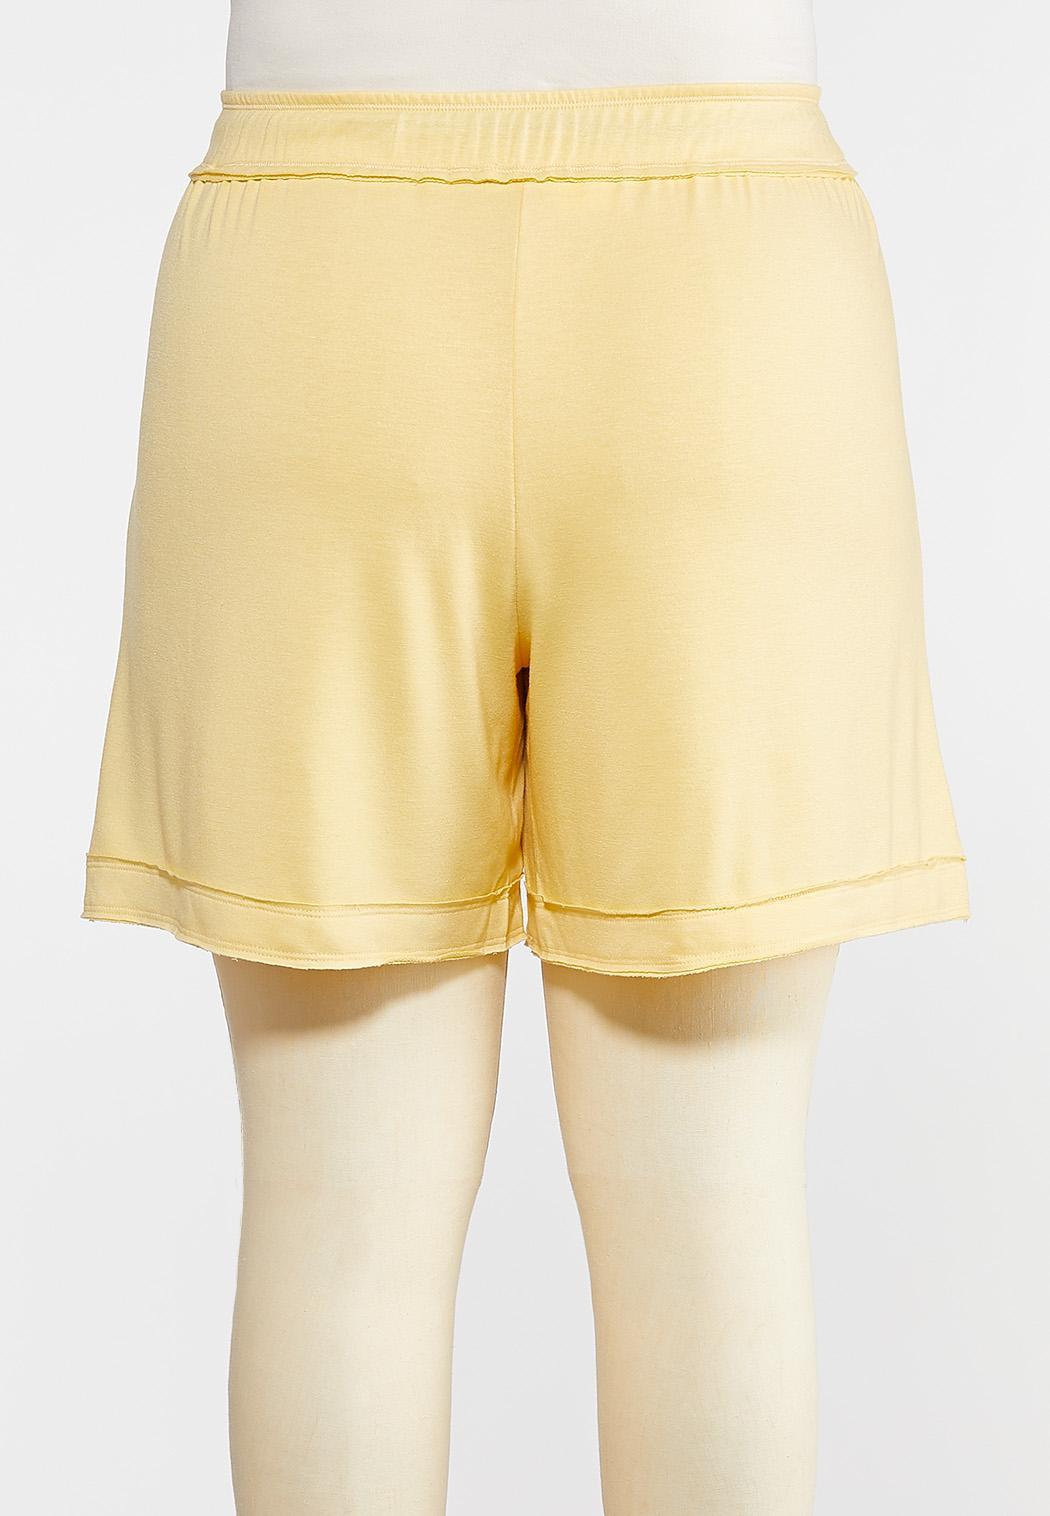 Plus Size French Terry Raw Hem Shorts (Item #44275977)